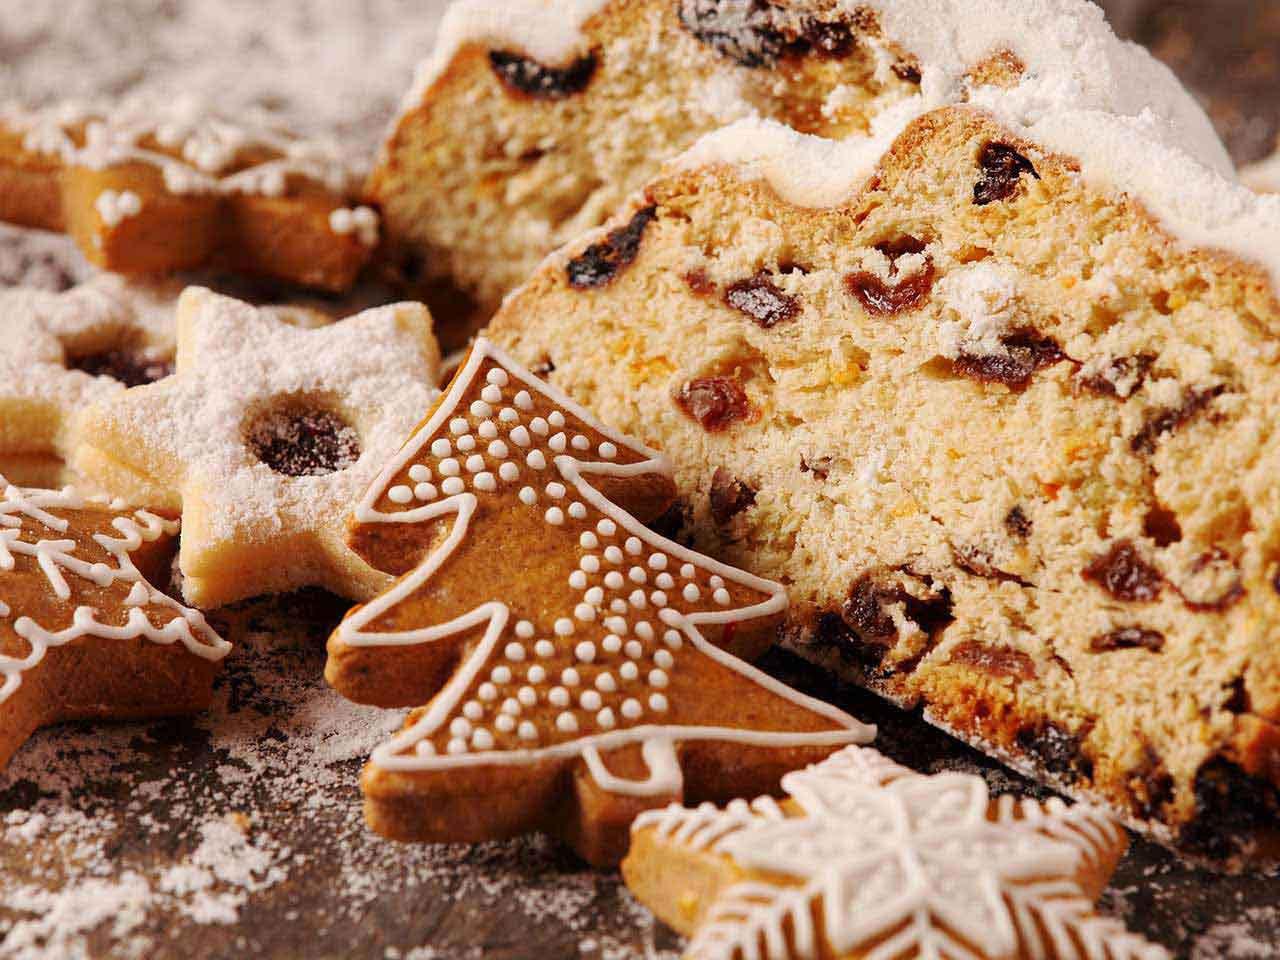 Christmas Baking Goods Recipes  Christmas baking ideas Saga